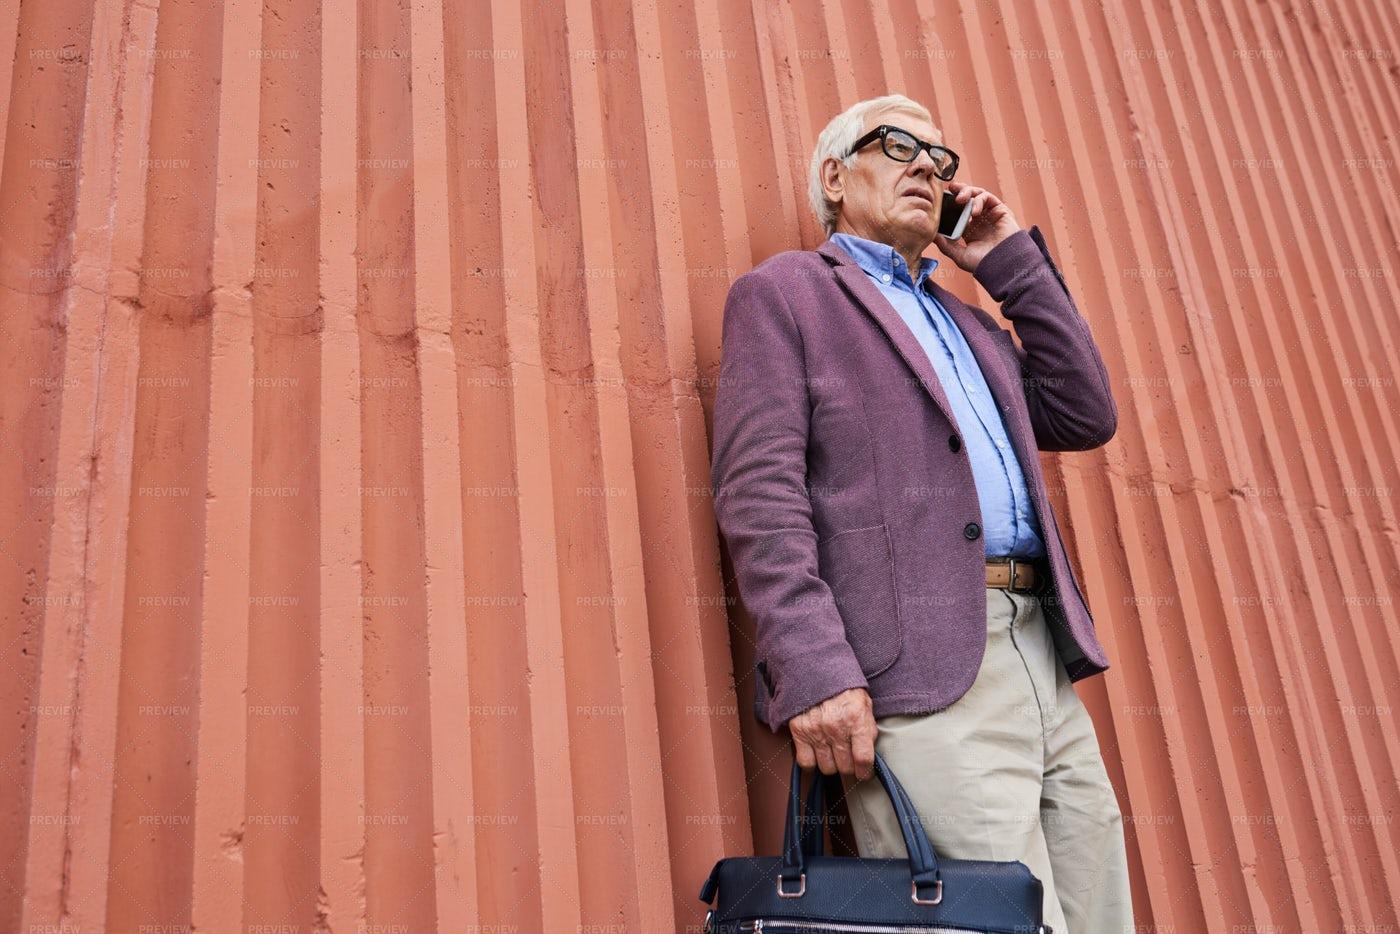 Stylish Senior Businessman Speaking...: Stock Photos